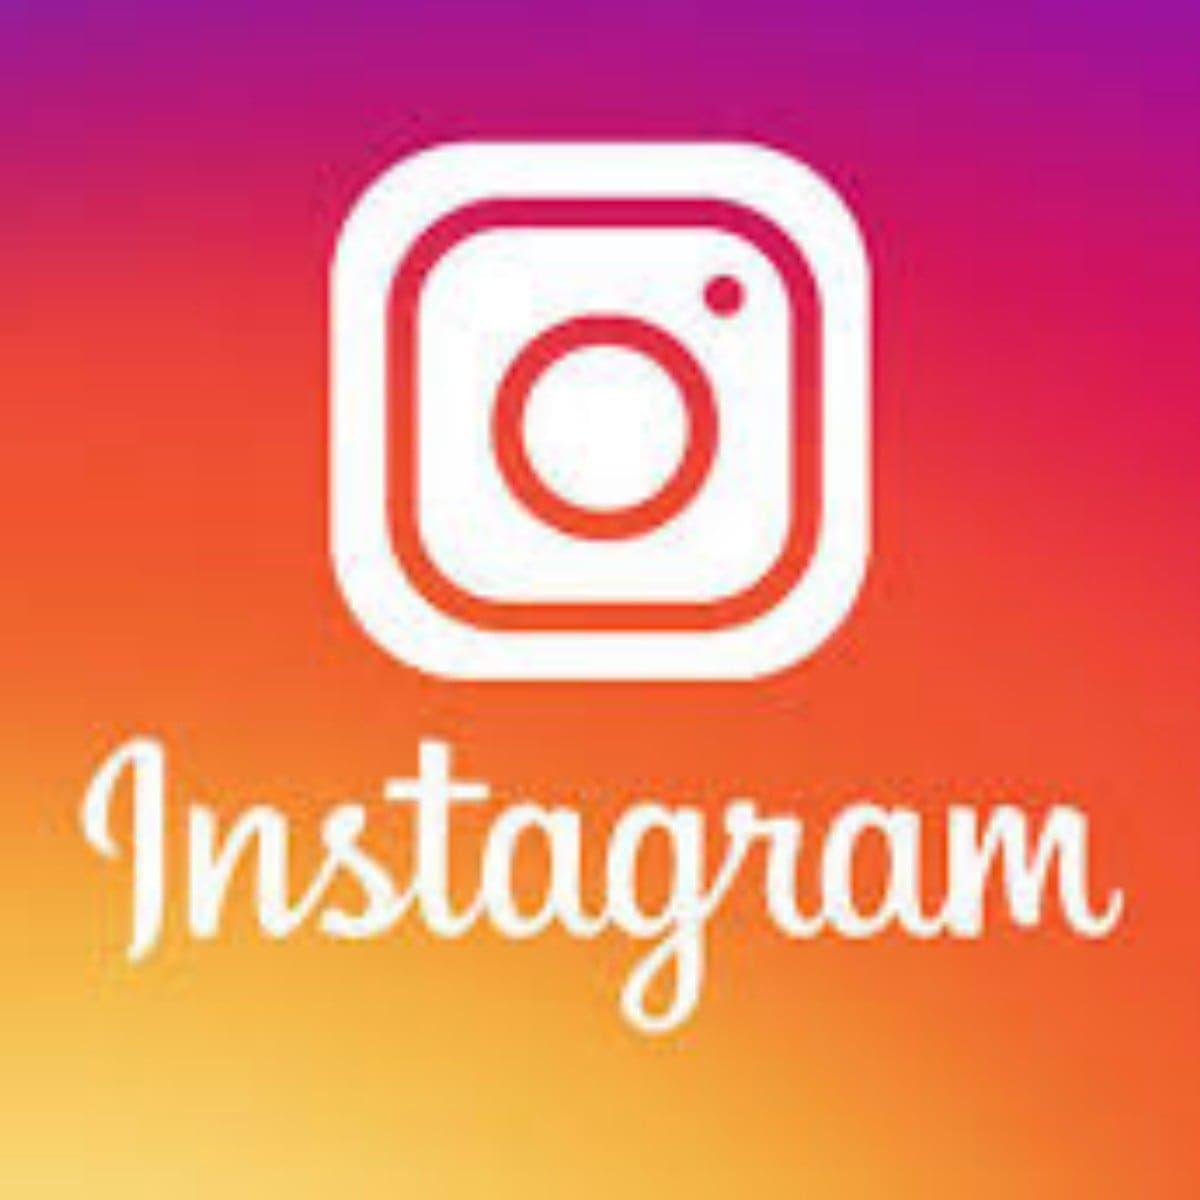 Business Model of Instagram - 1